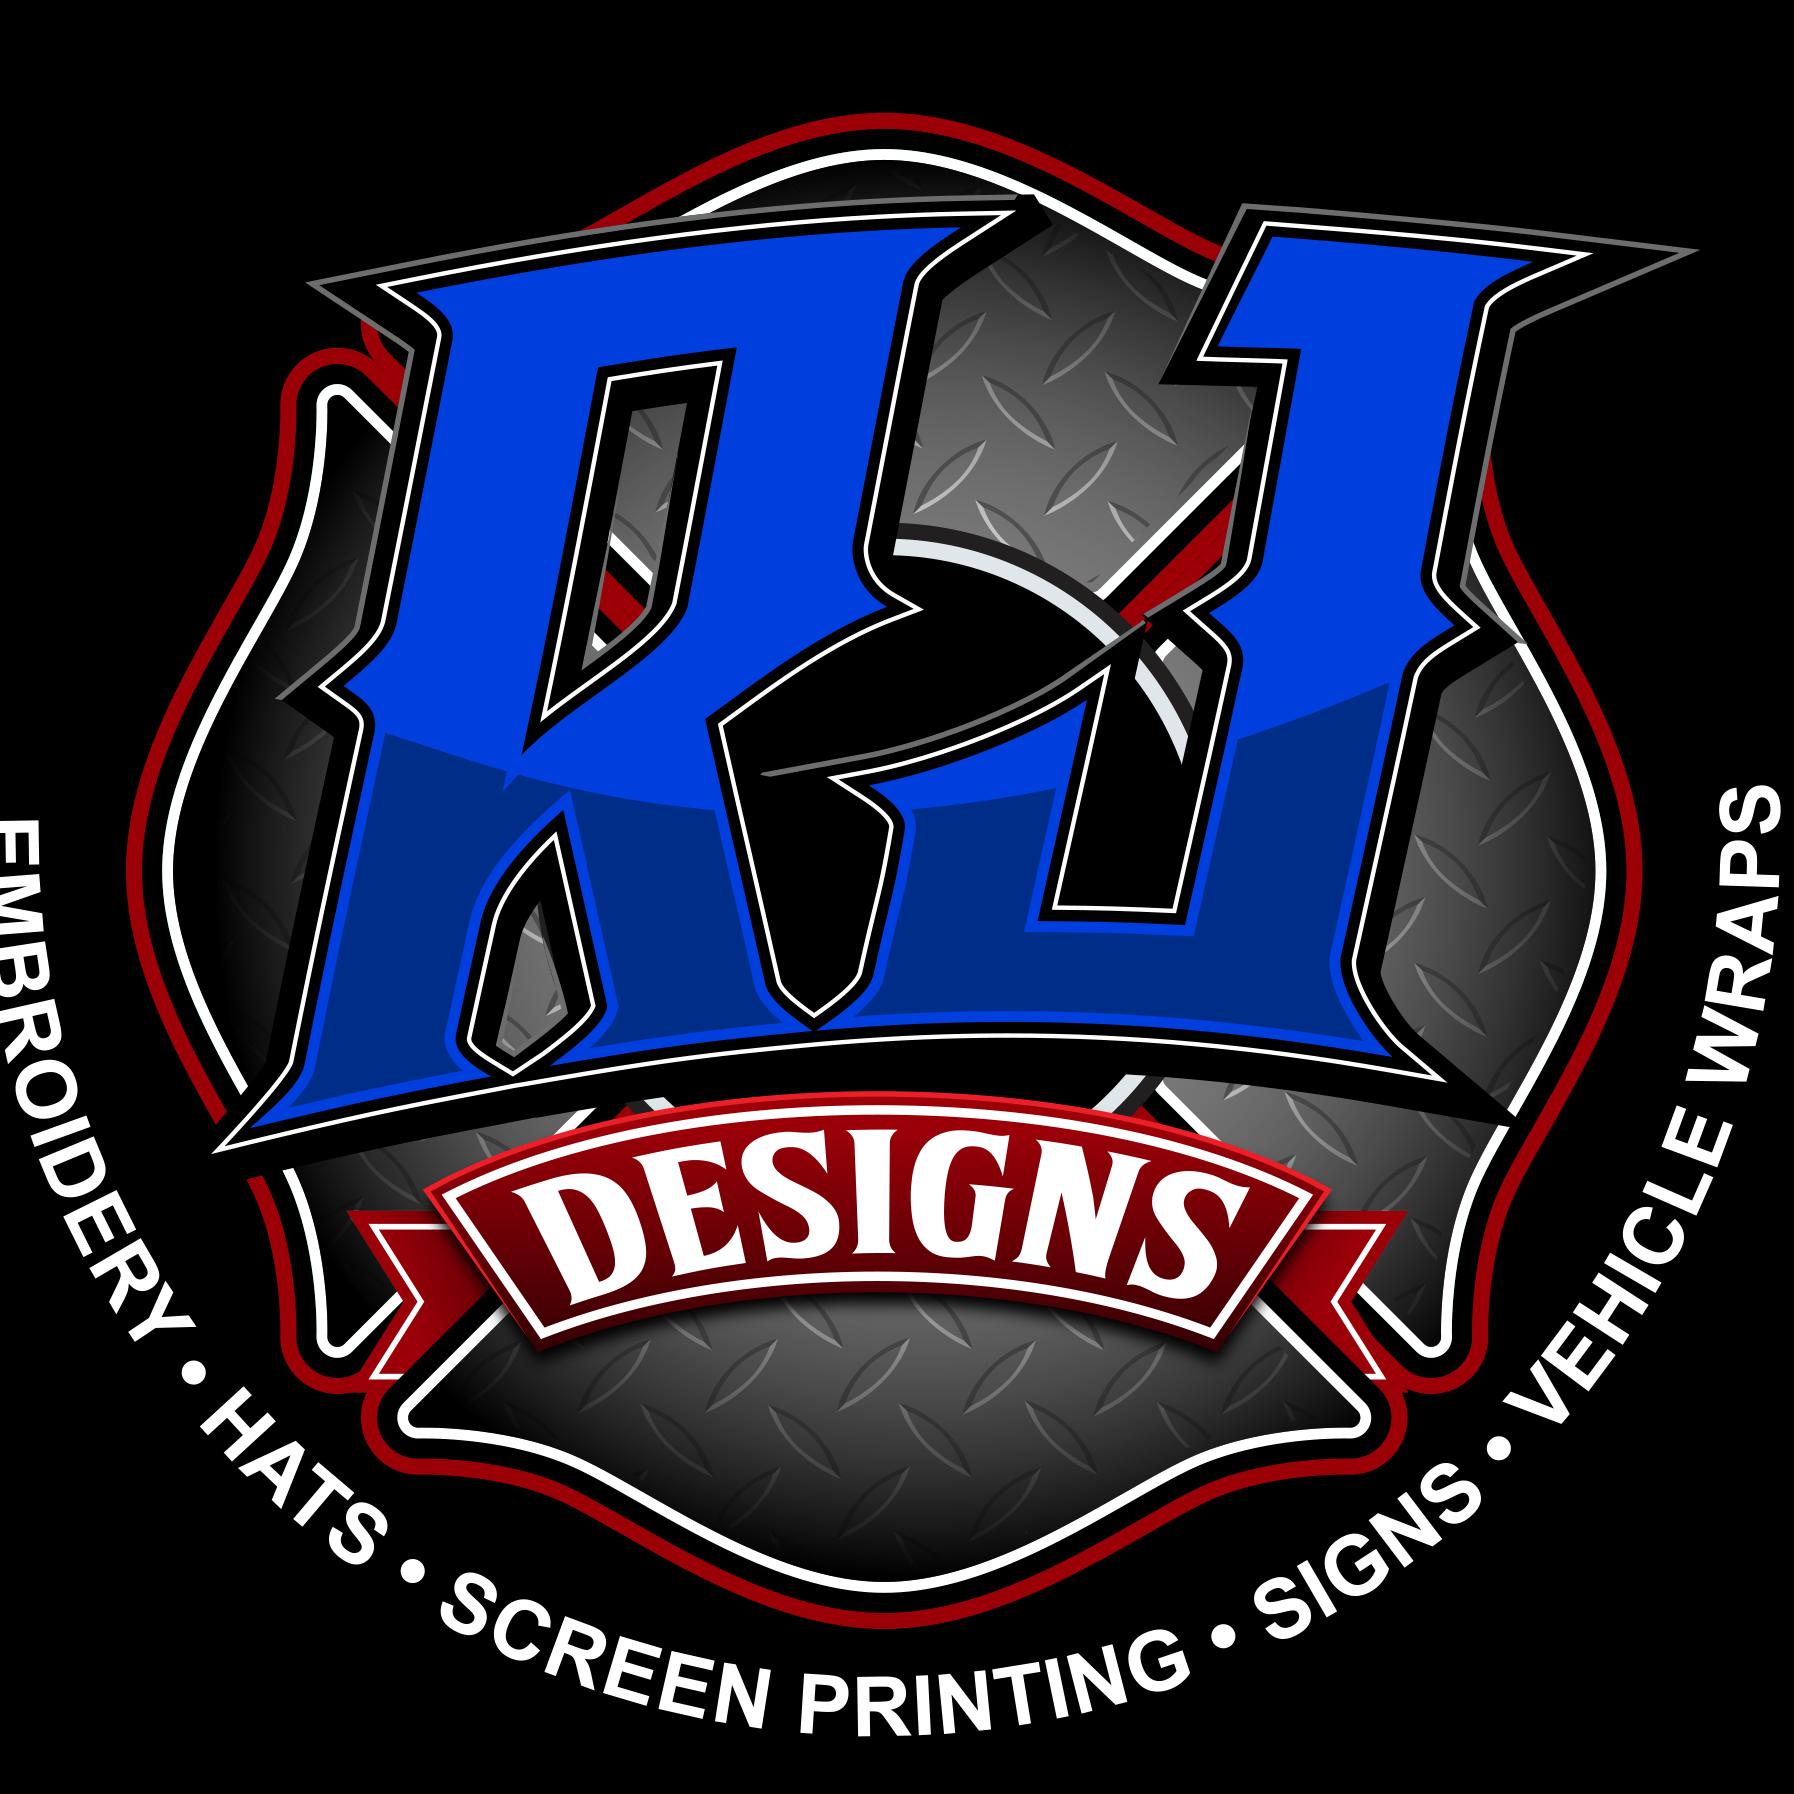 Screen Printing Company in Terrell, TX